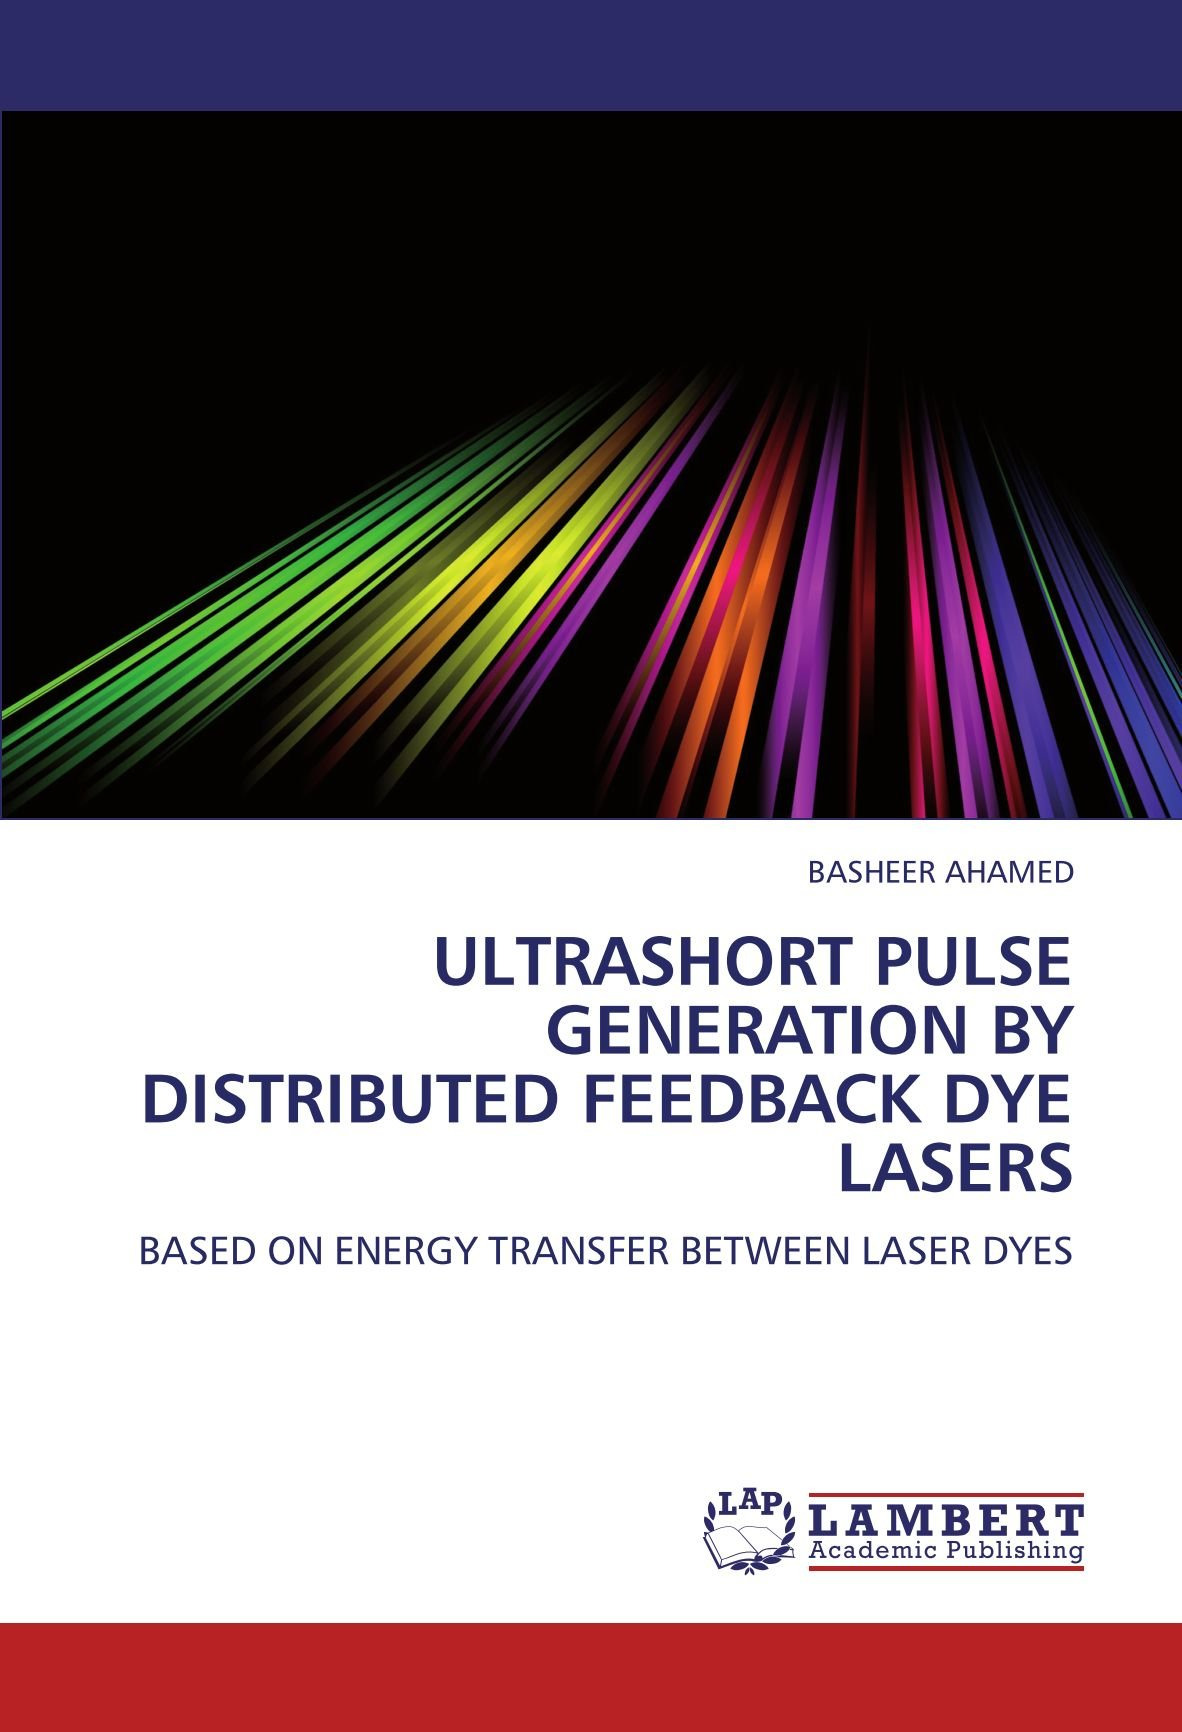 Read Online ULTRASHORT PULSE GENERATION BY DISTRIBUTED FEEDBACK DYE LASERS: BASED ON ENERGY TRANSFER BETWEEN LASER DYES PDF